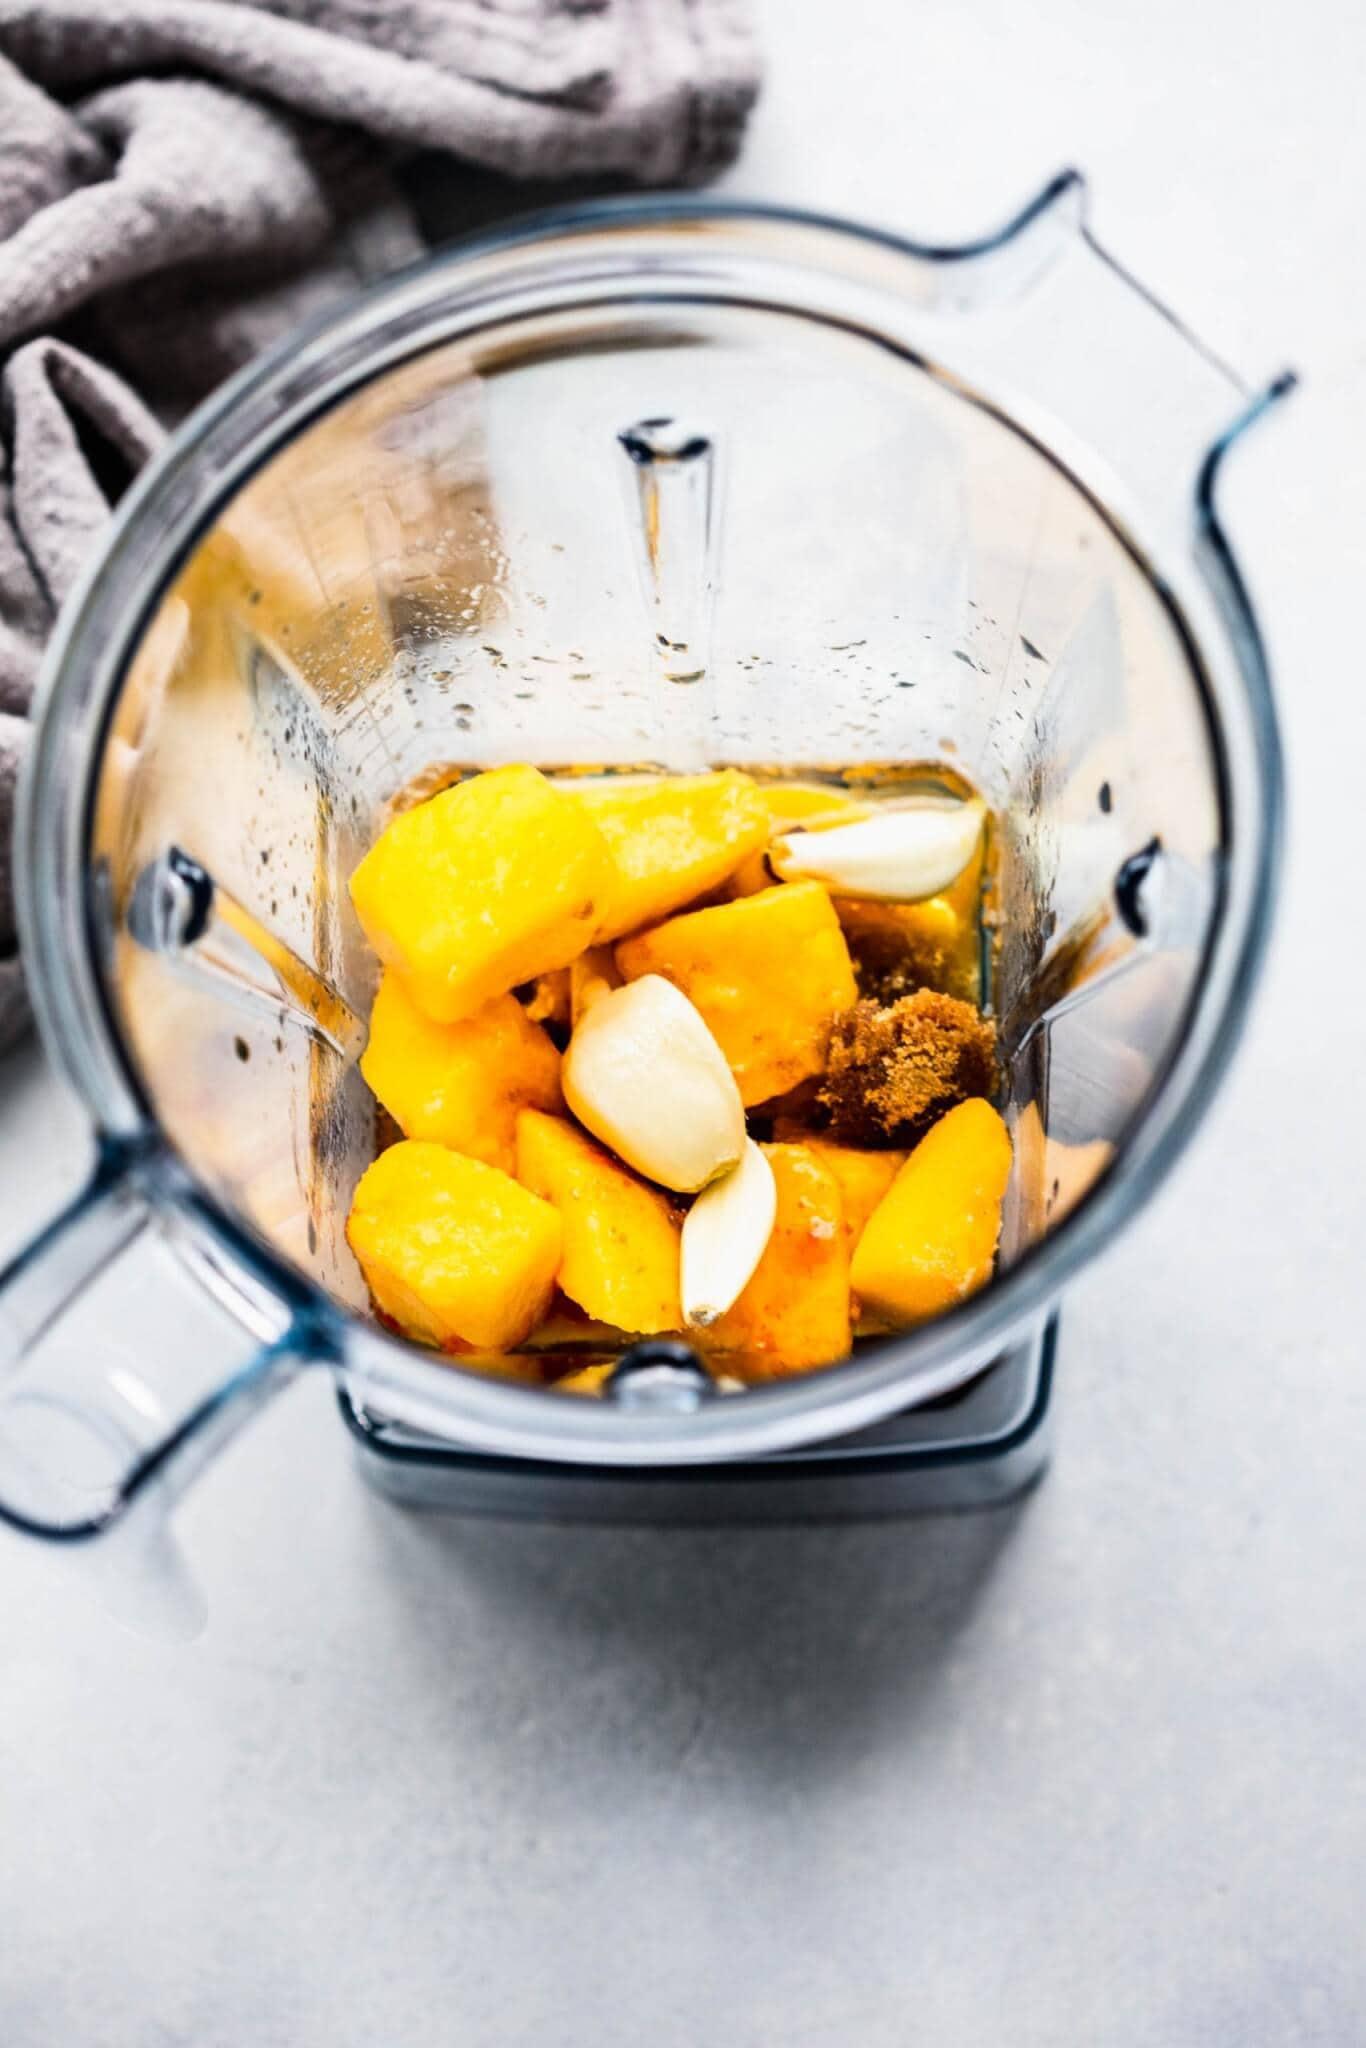 Ingredients for mango marinade in blender